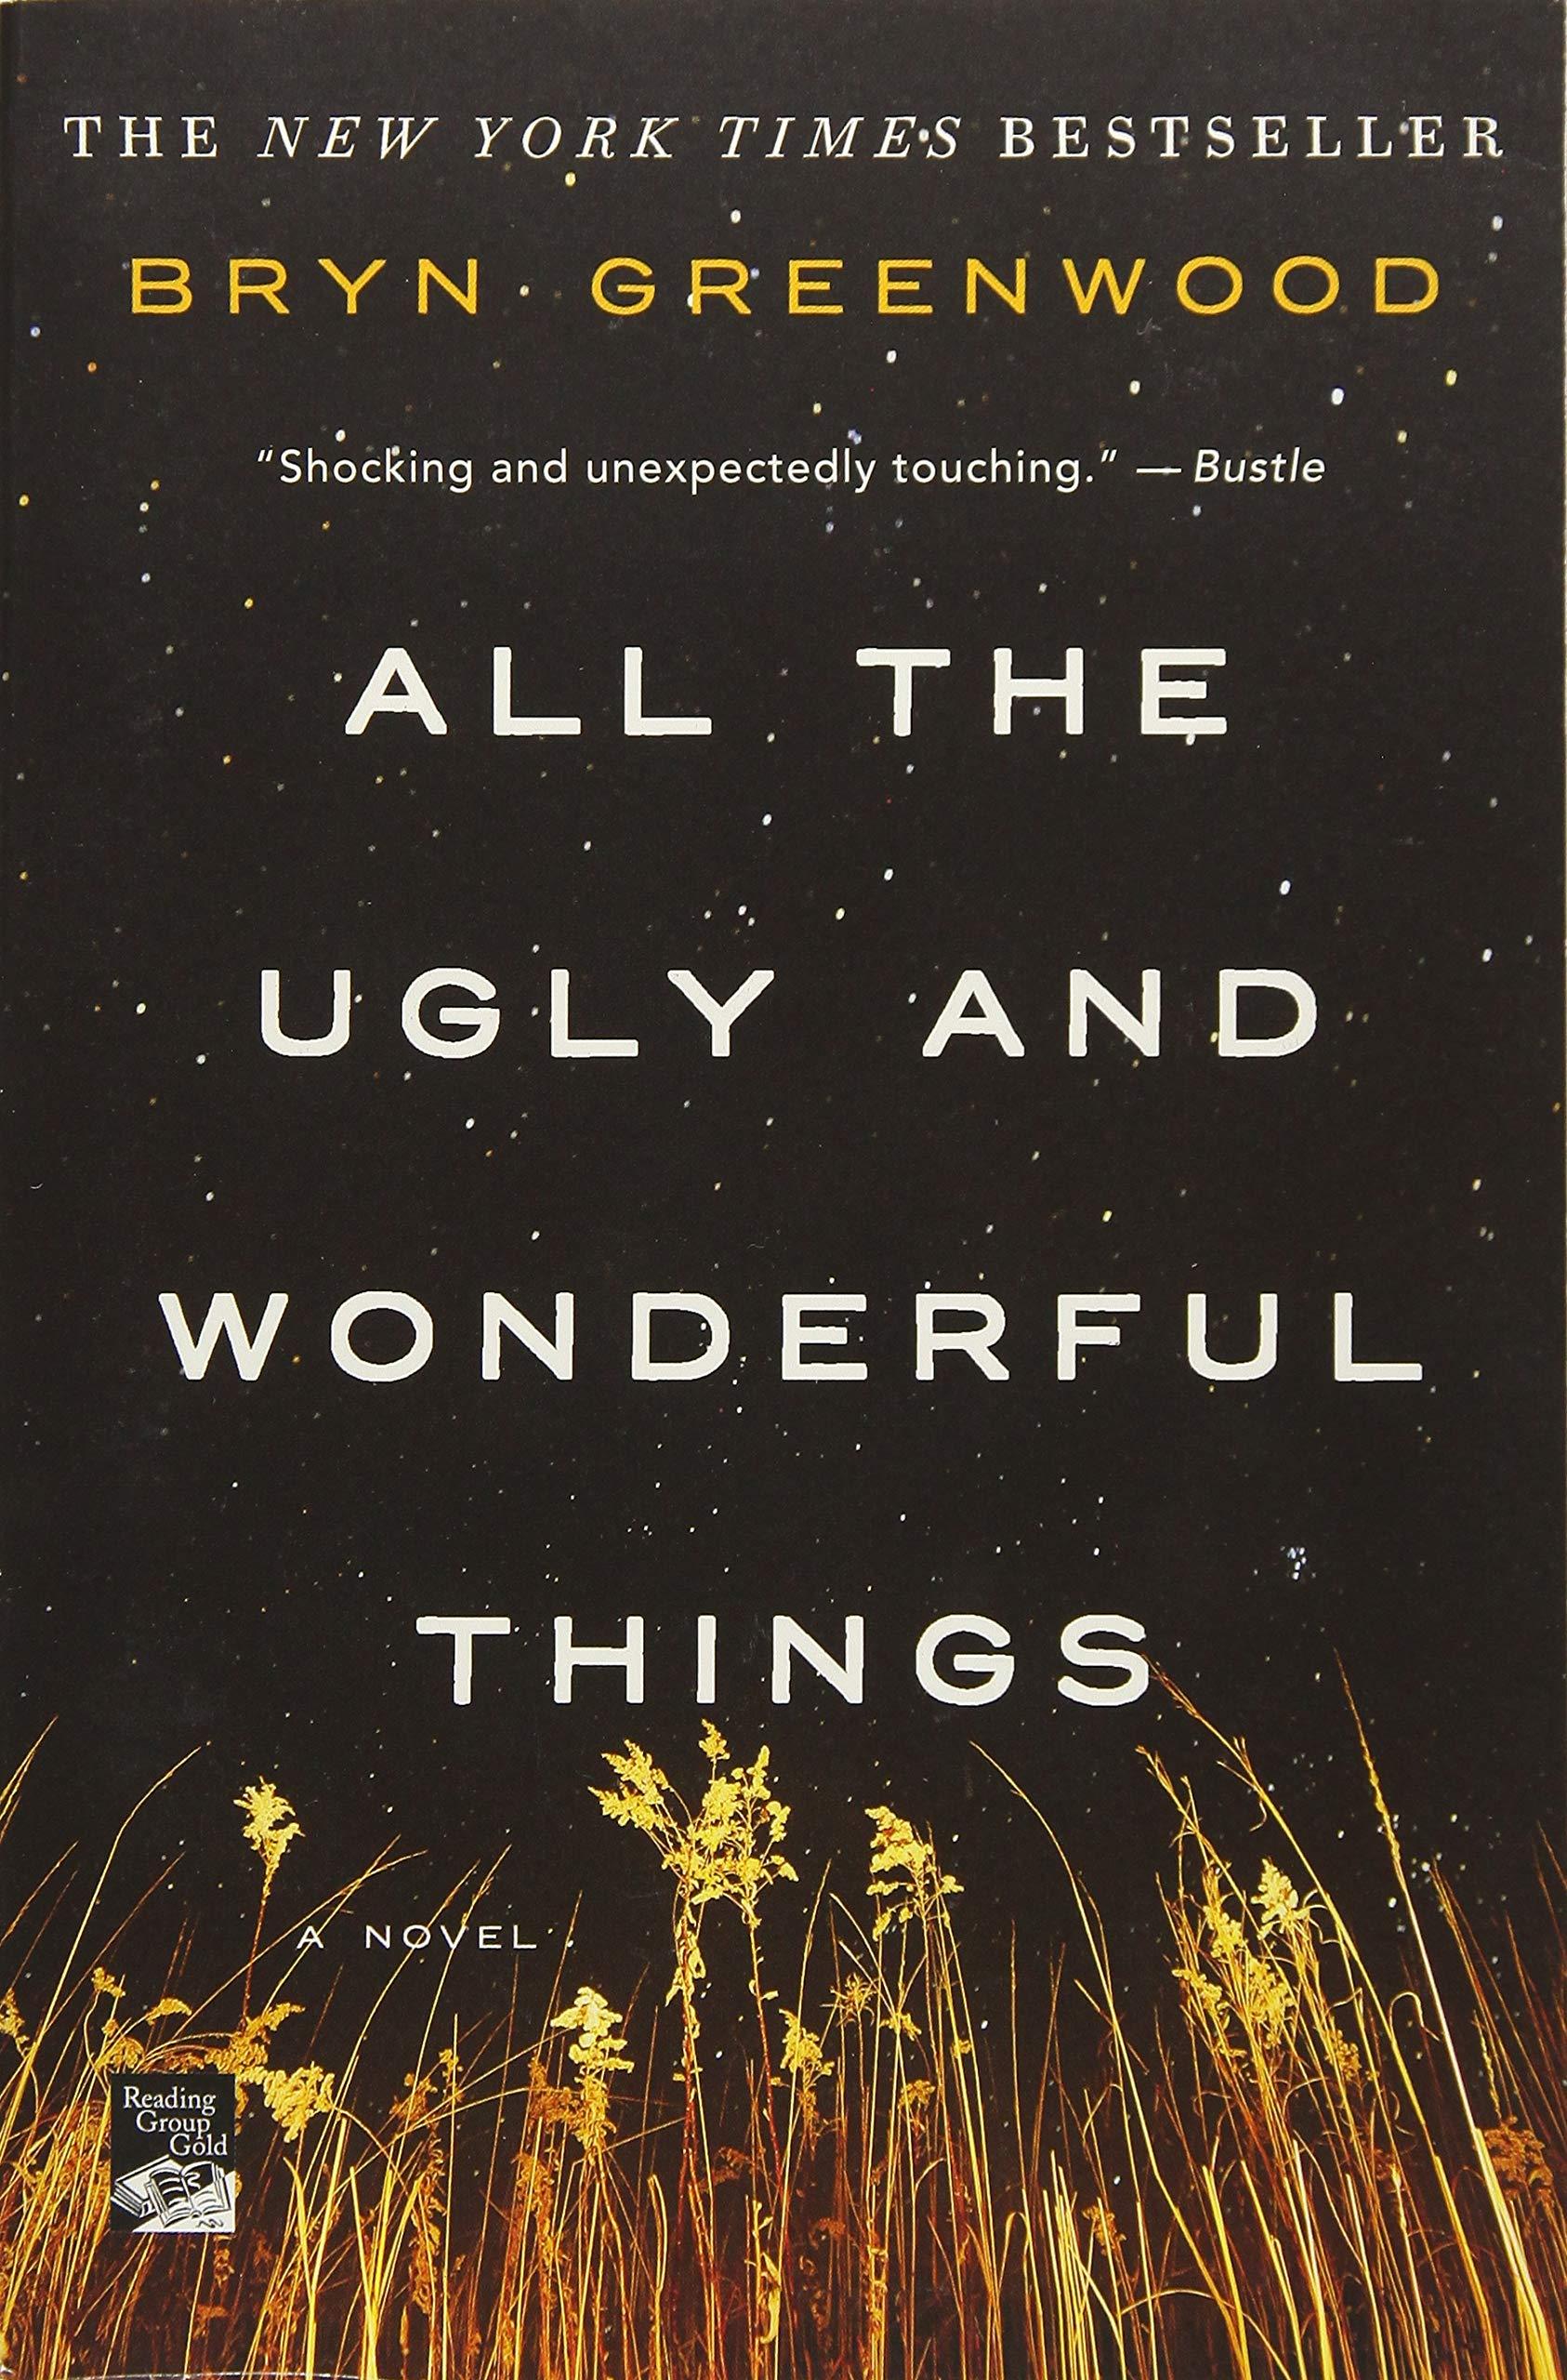 All Ugly Wonderful Things Novel product image